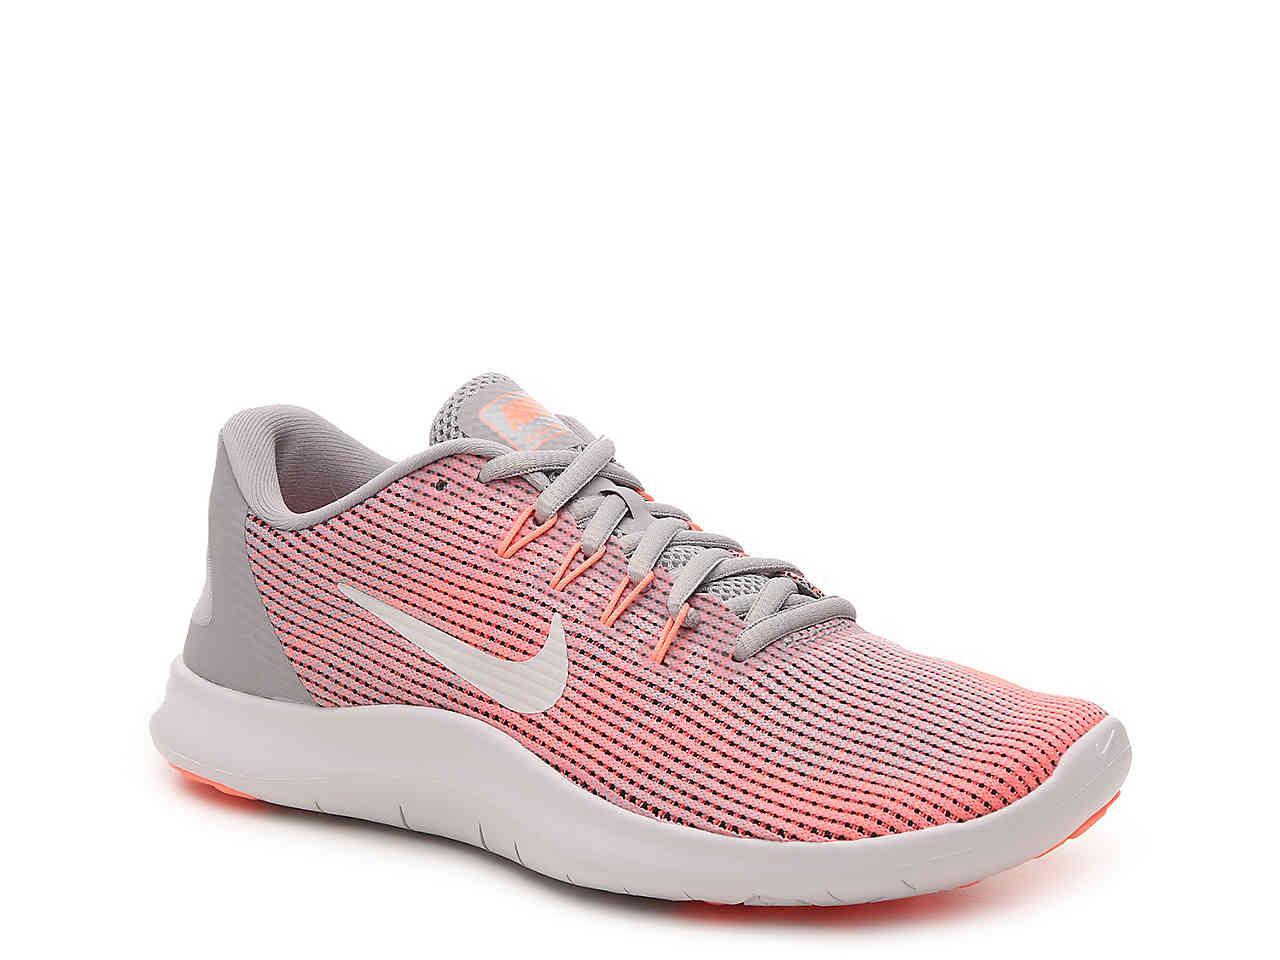 4f75295f2e479 get sale athletic nike nike zoom winflo 3 premium lightweight running shoe  dsw 354331 b7a56 9ead6  top quality lyst nike flex 18 rn lightweight  running shoe ...